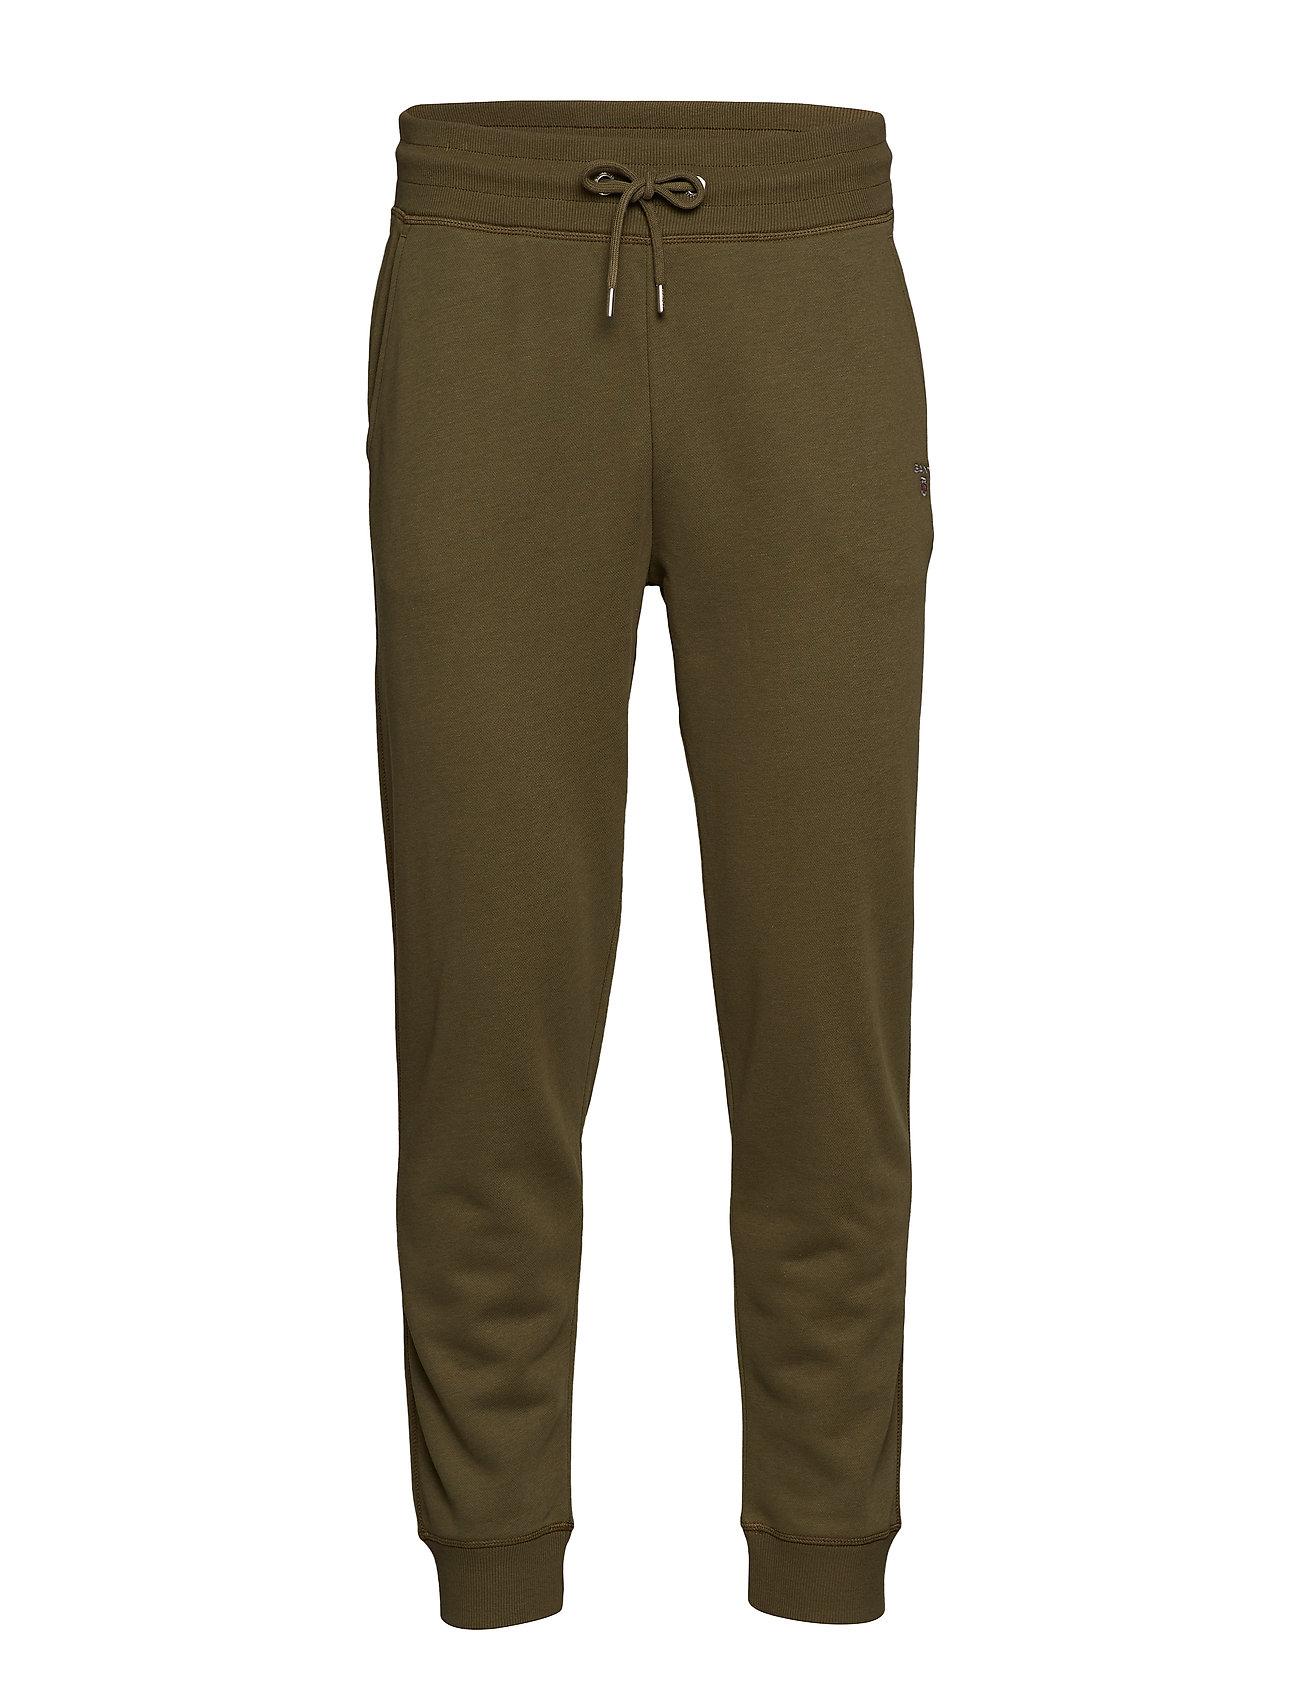 Gant THE ORIGINAL SWEAT PANTS - FIELD GREEN